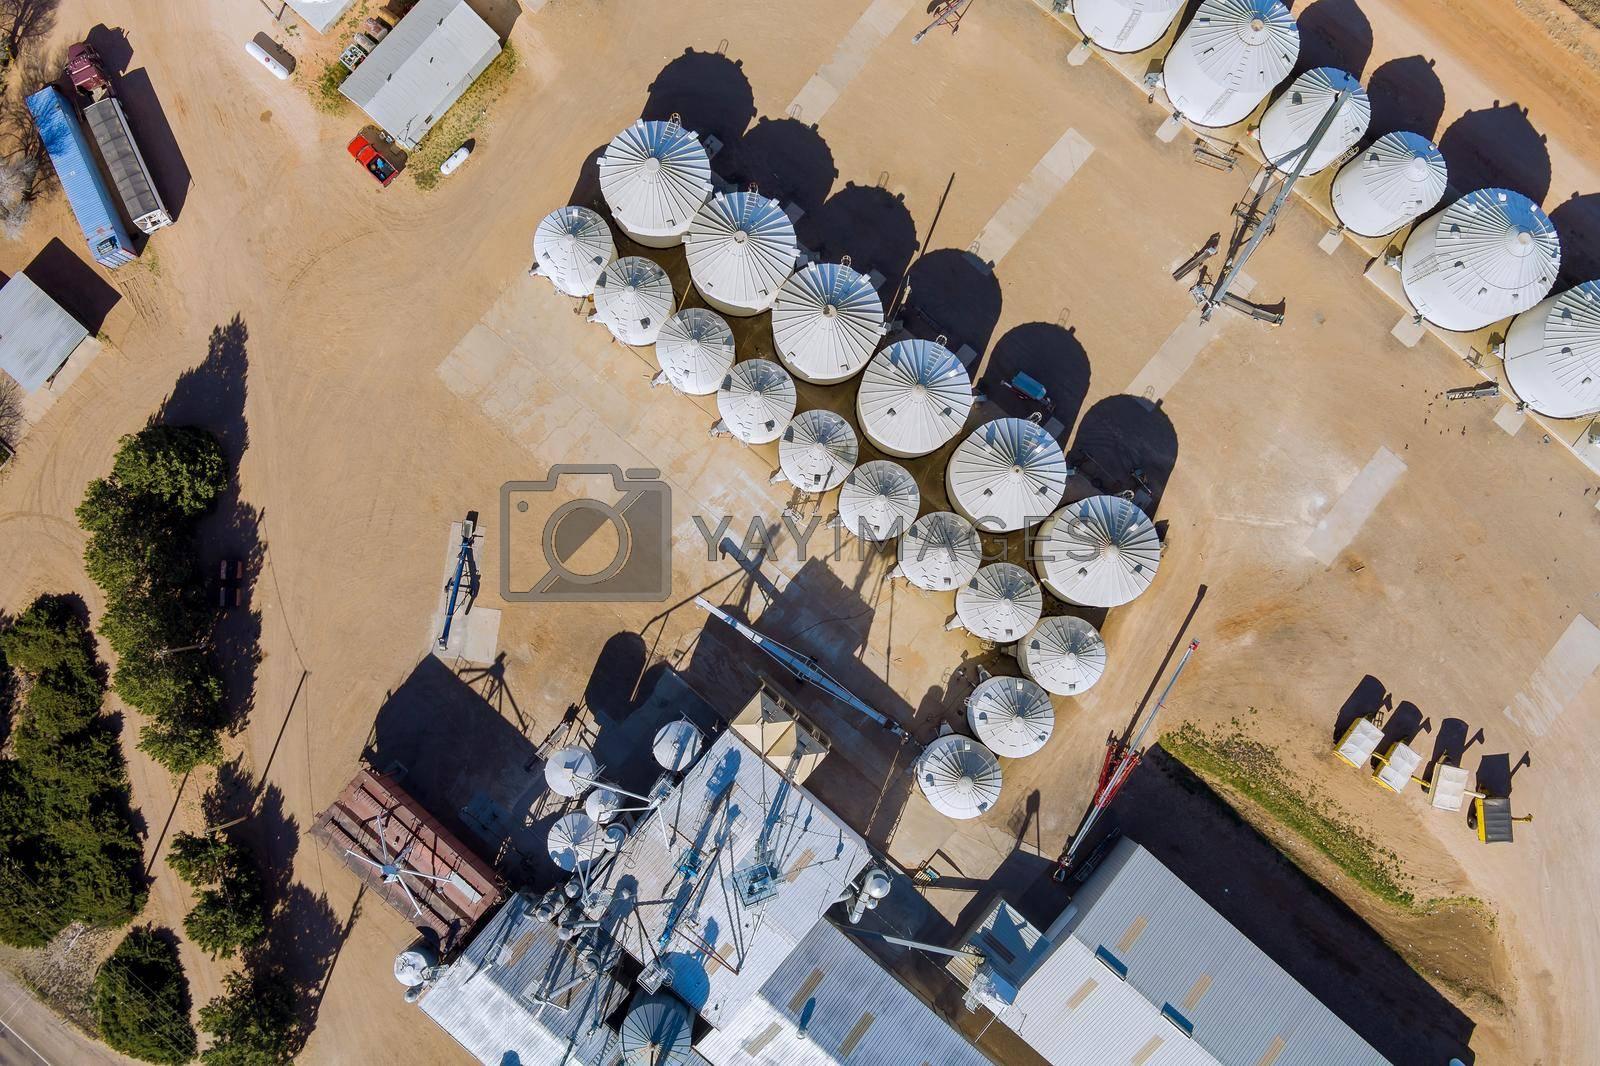 Grain elevator terminal spout loading grain corn silos, storage containers drying grain complex